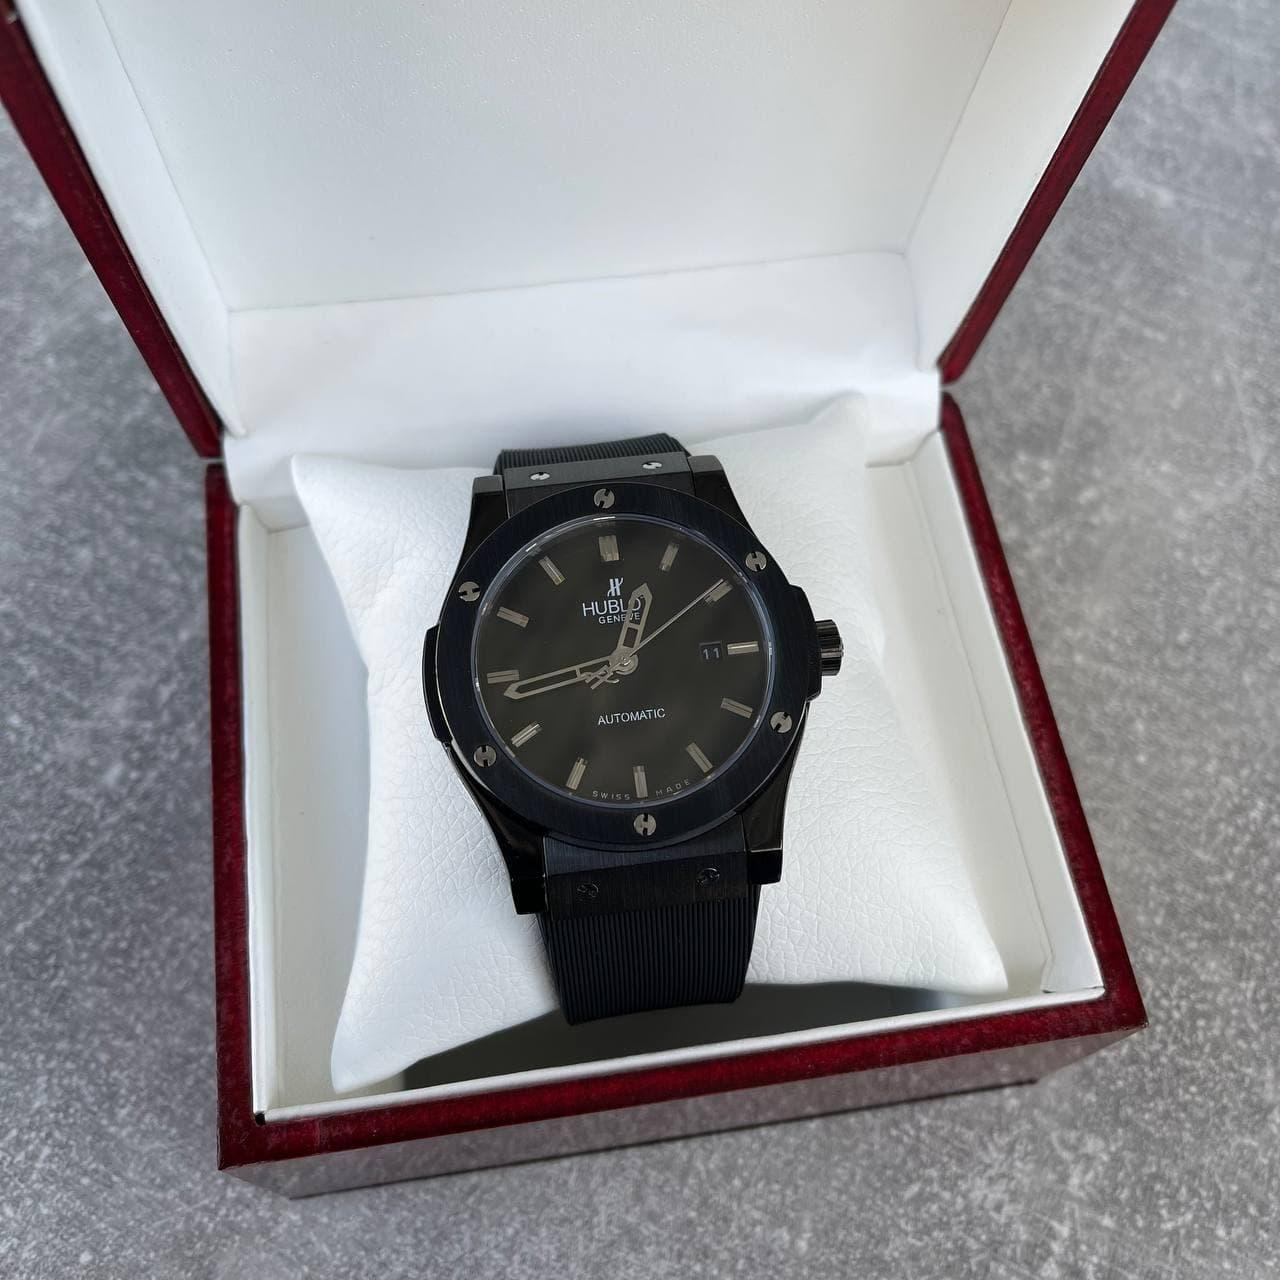 Часы наручные H u b l o t  Classic Fusion All Black премиального ААА класса